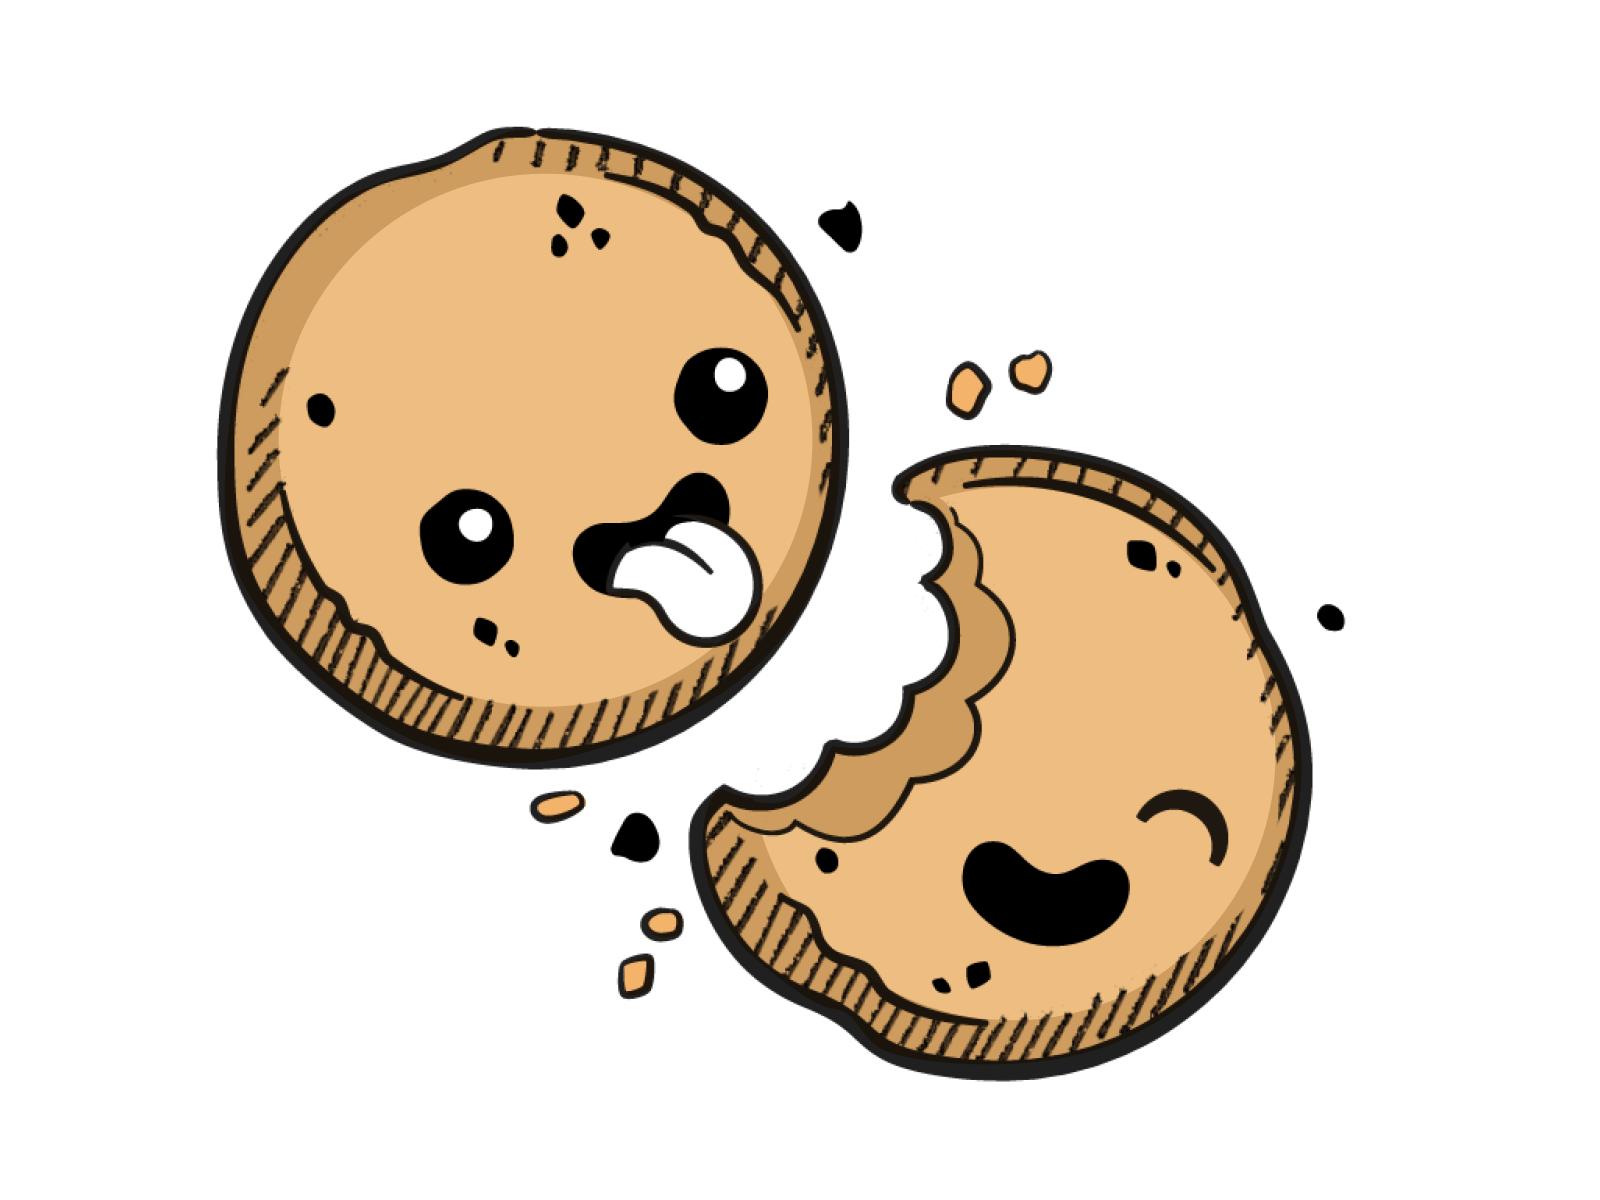 Cookies by Clint Kadera